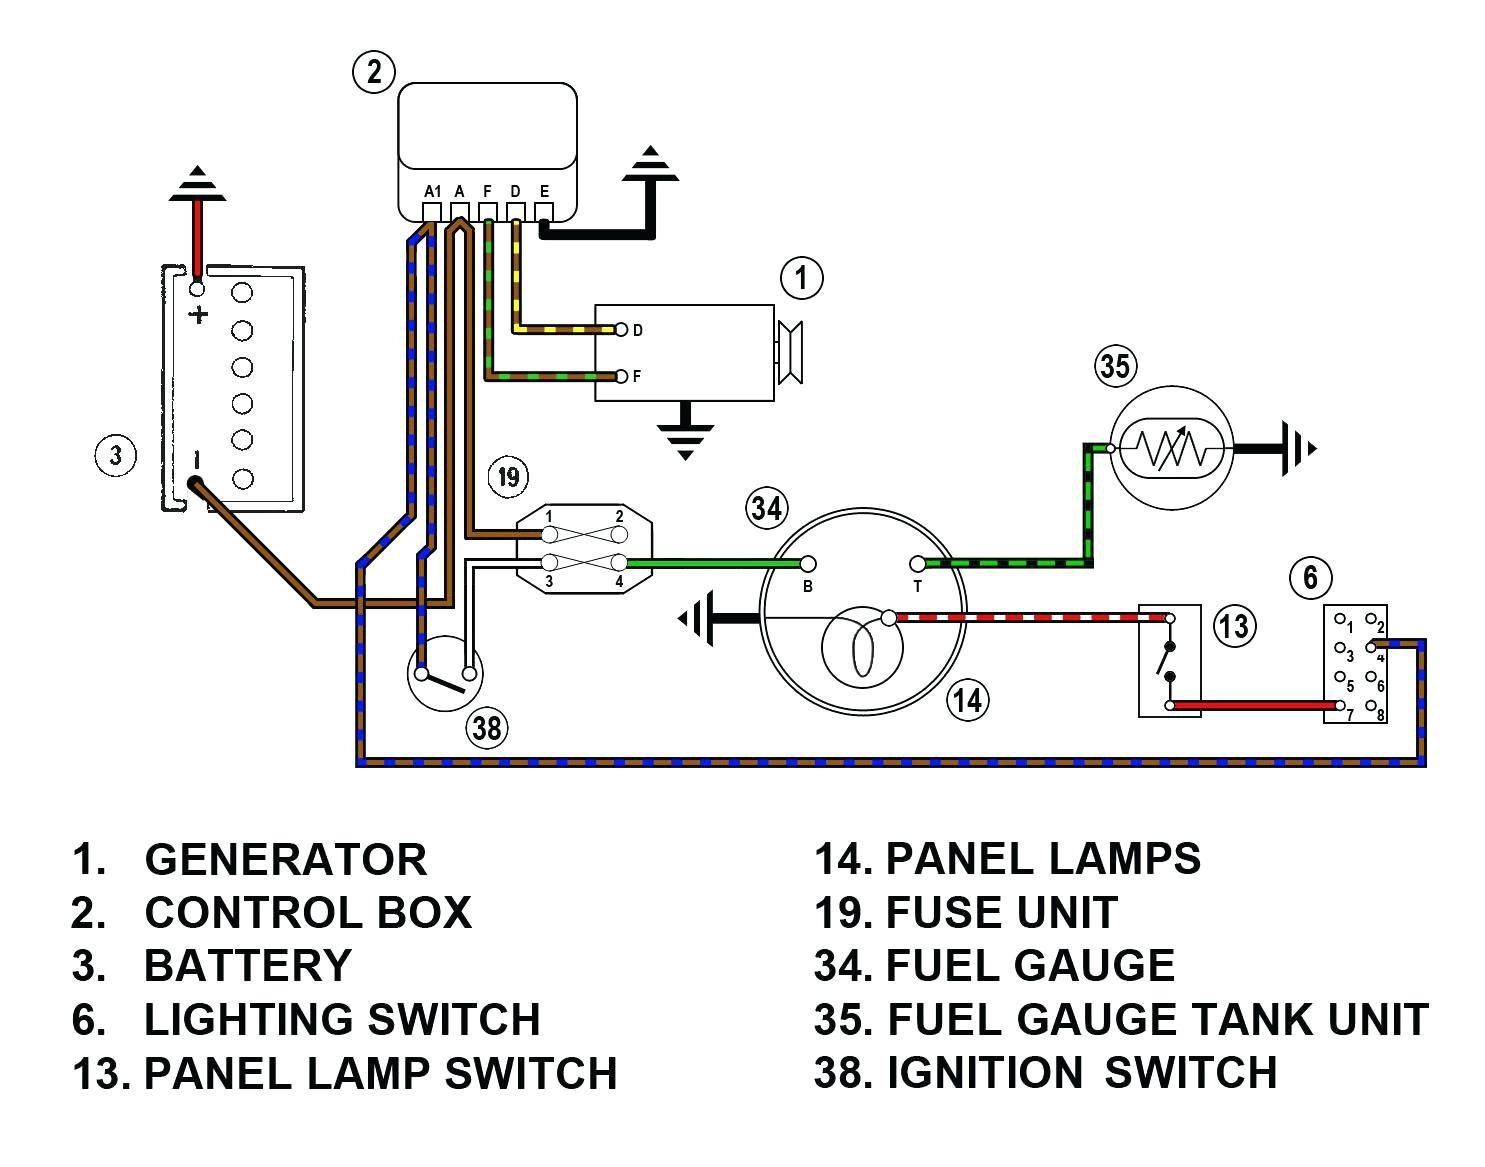 pj wiring diagram spa panel wiring diagram database pj spa wiring diagram pannel